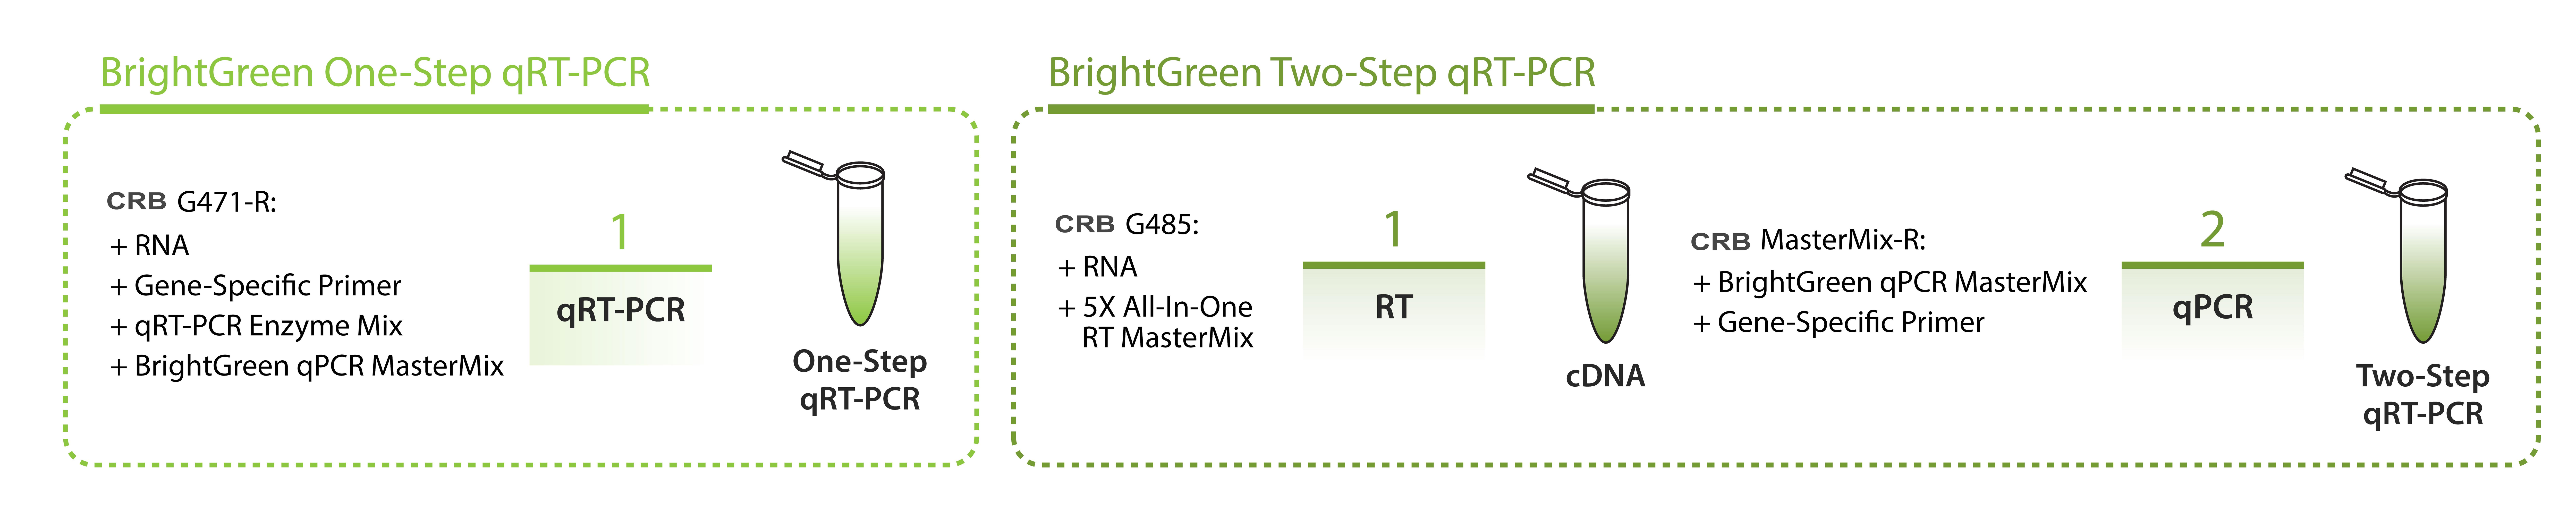 One-Step BrightGreen qRT-PCR-ROX G471-R